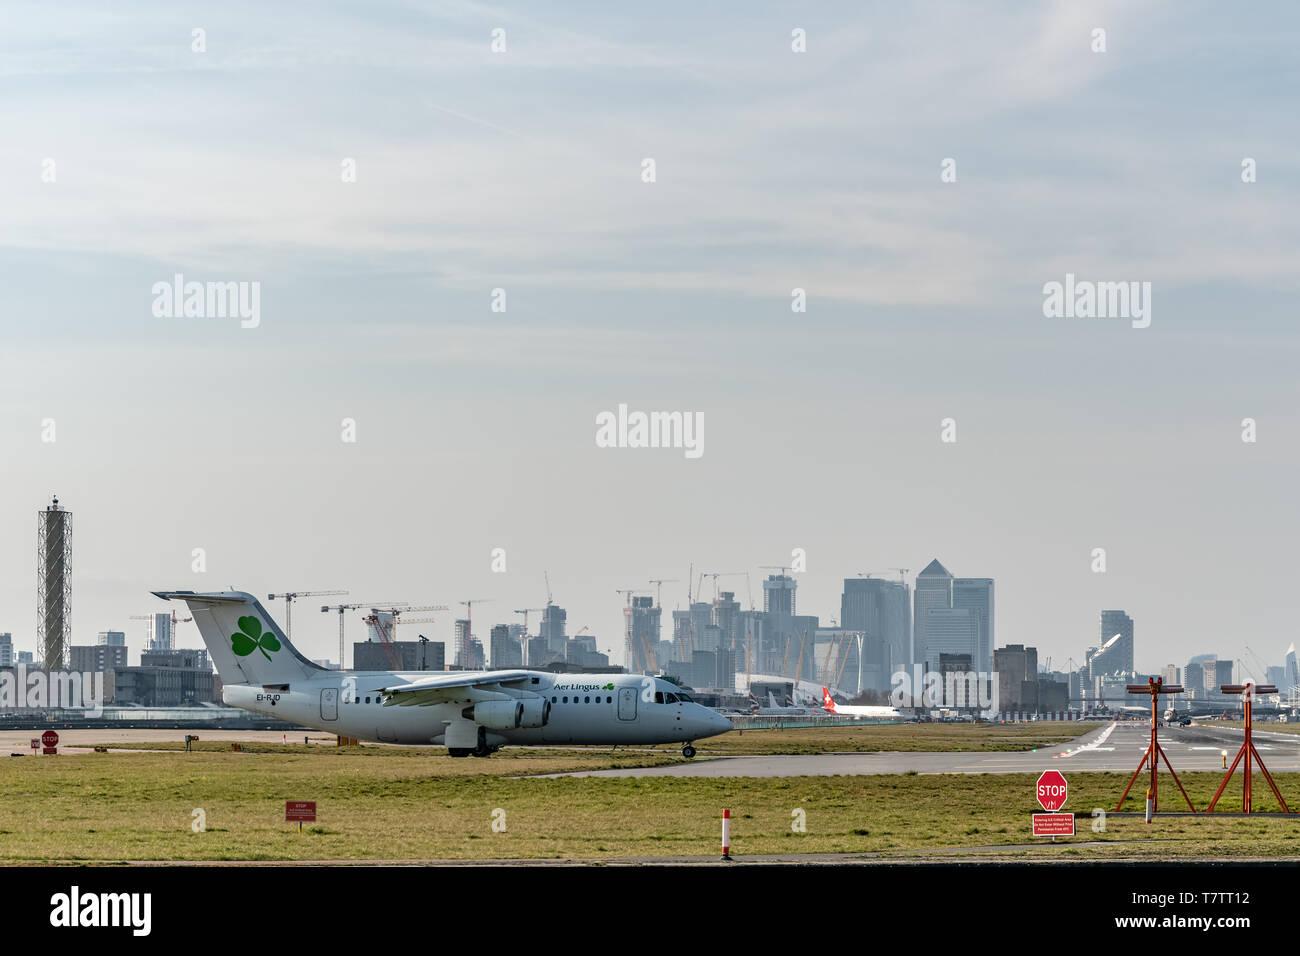 London, UK - 17, February 2019: CityJet a Irish regional airline based in Dublin, British Aerospace aircraft type Avro RJ85 at the London City Airport - Stock Image